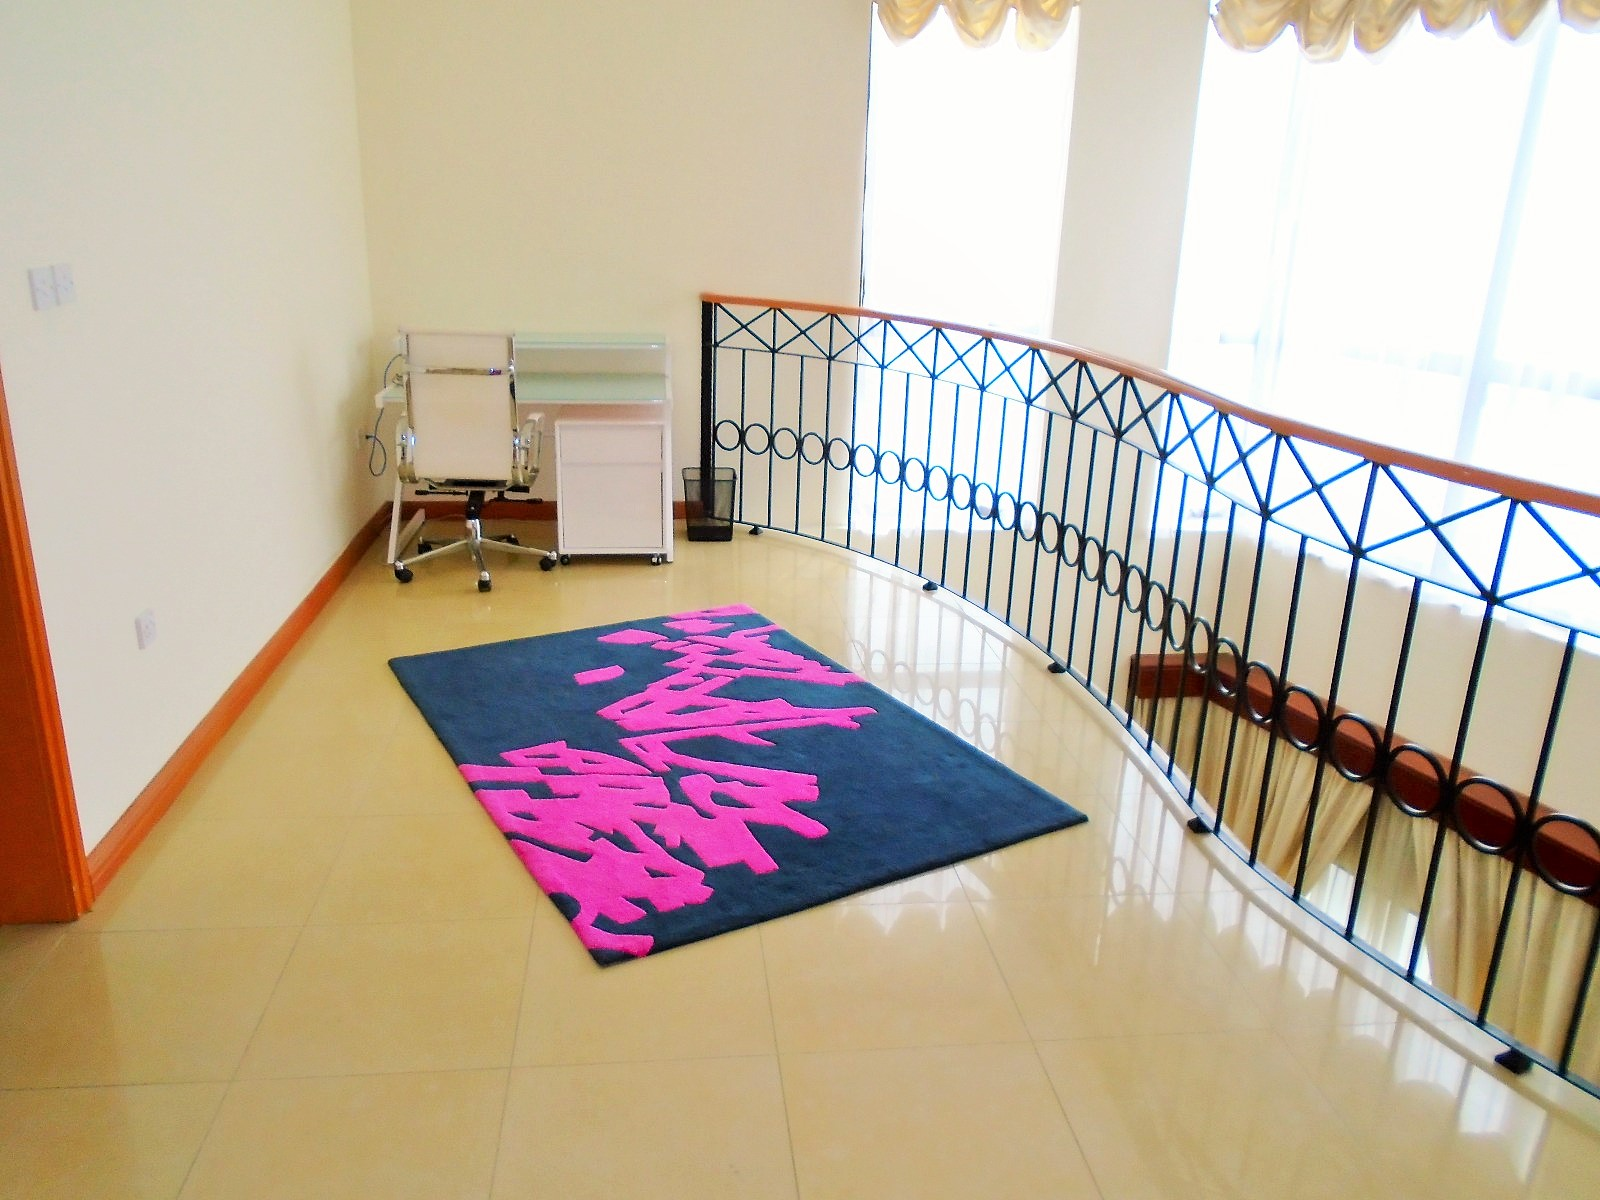 2 Bedroom Dublex 6